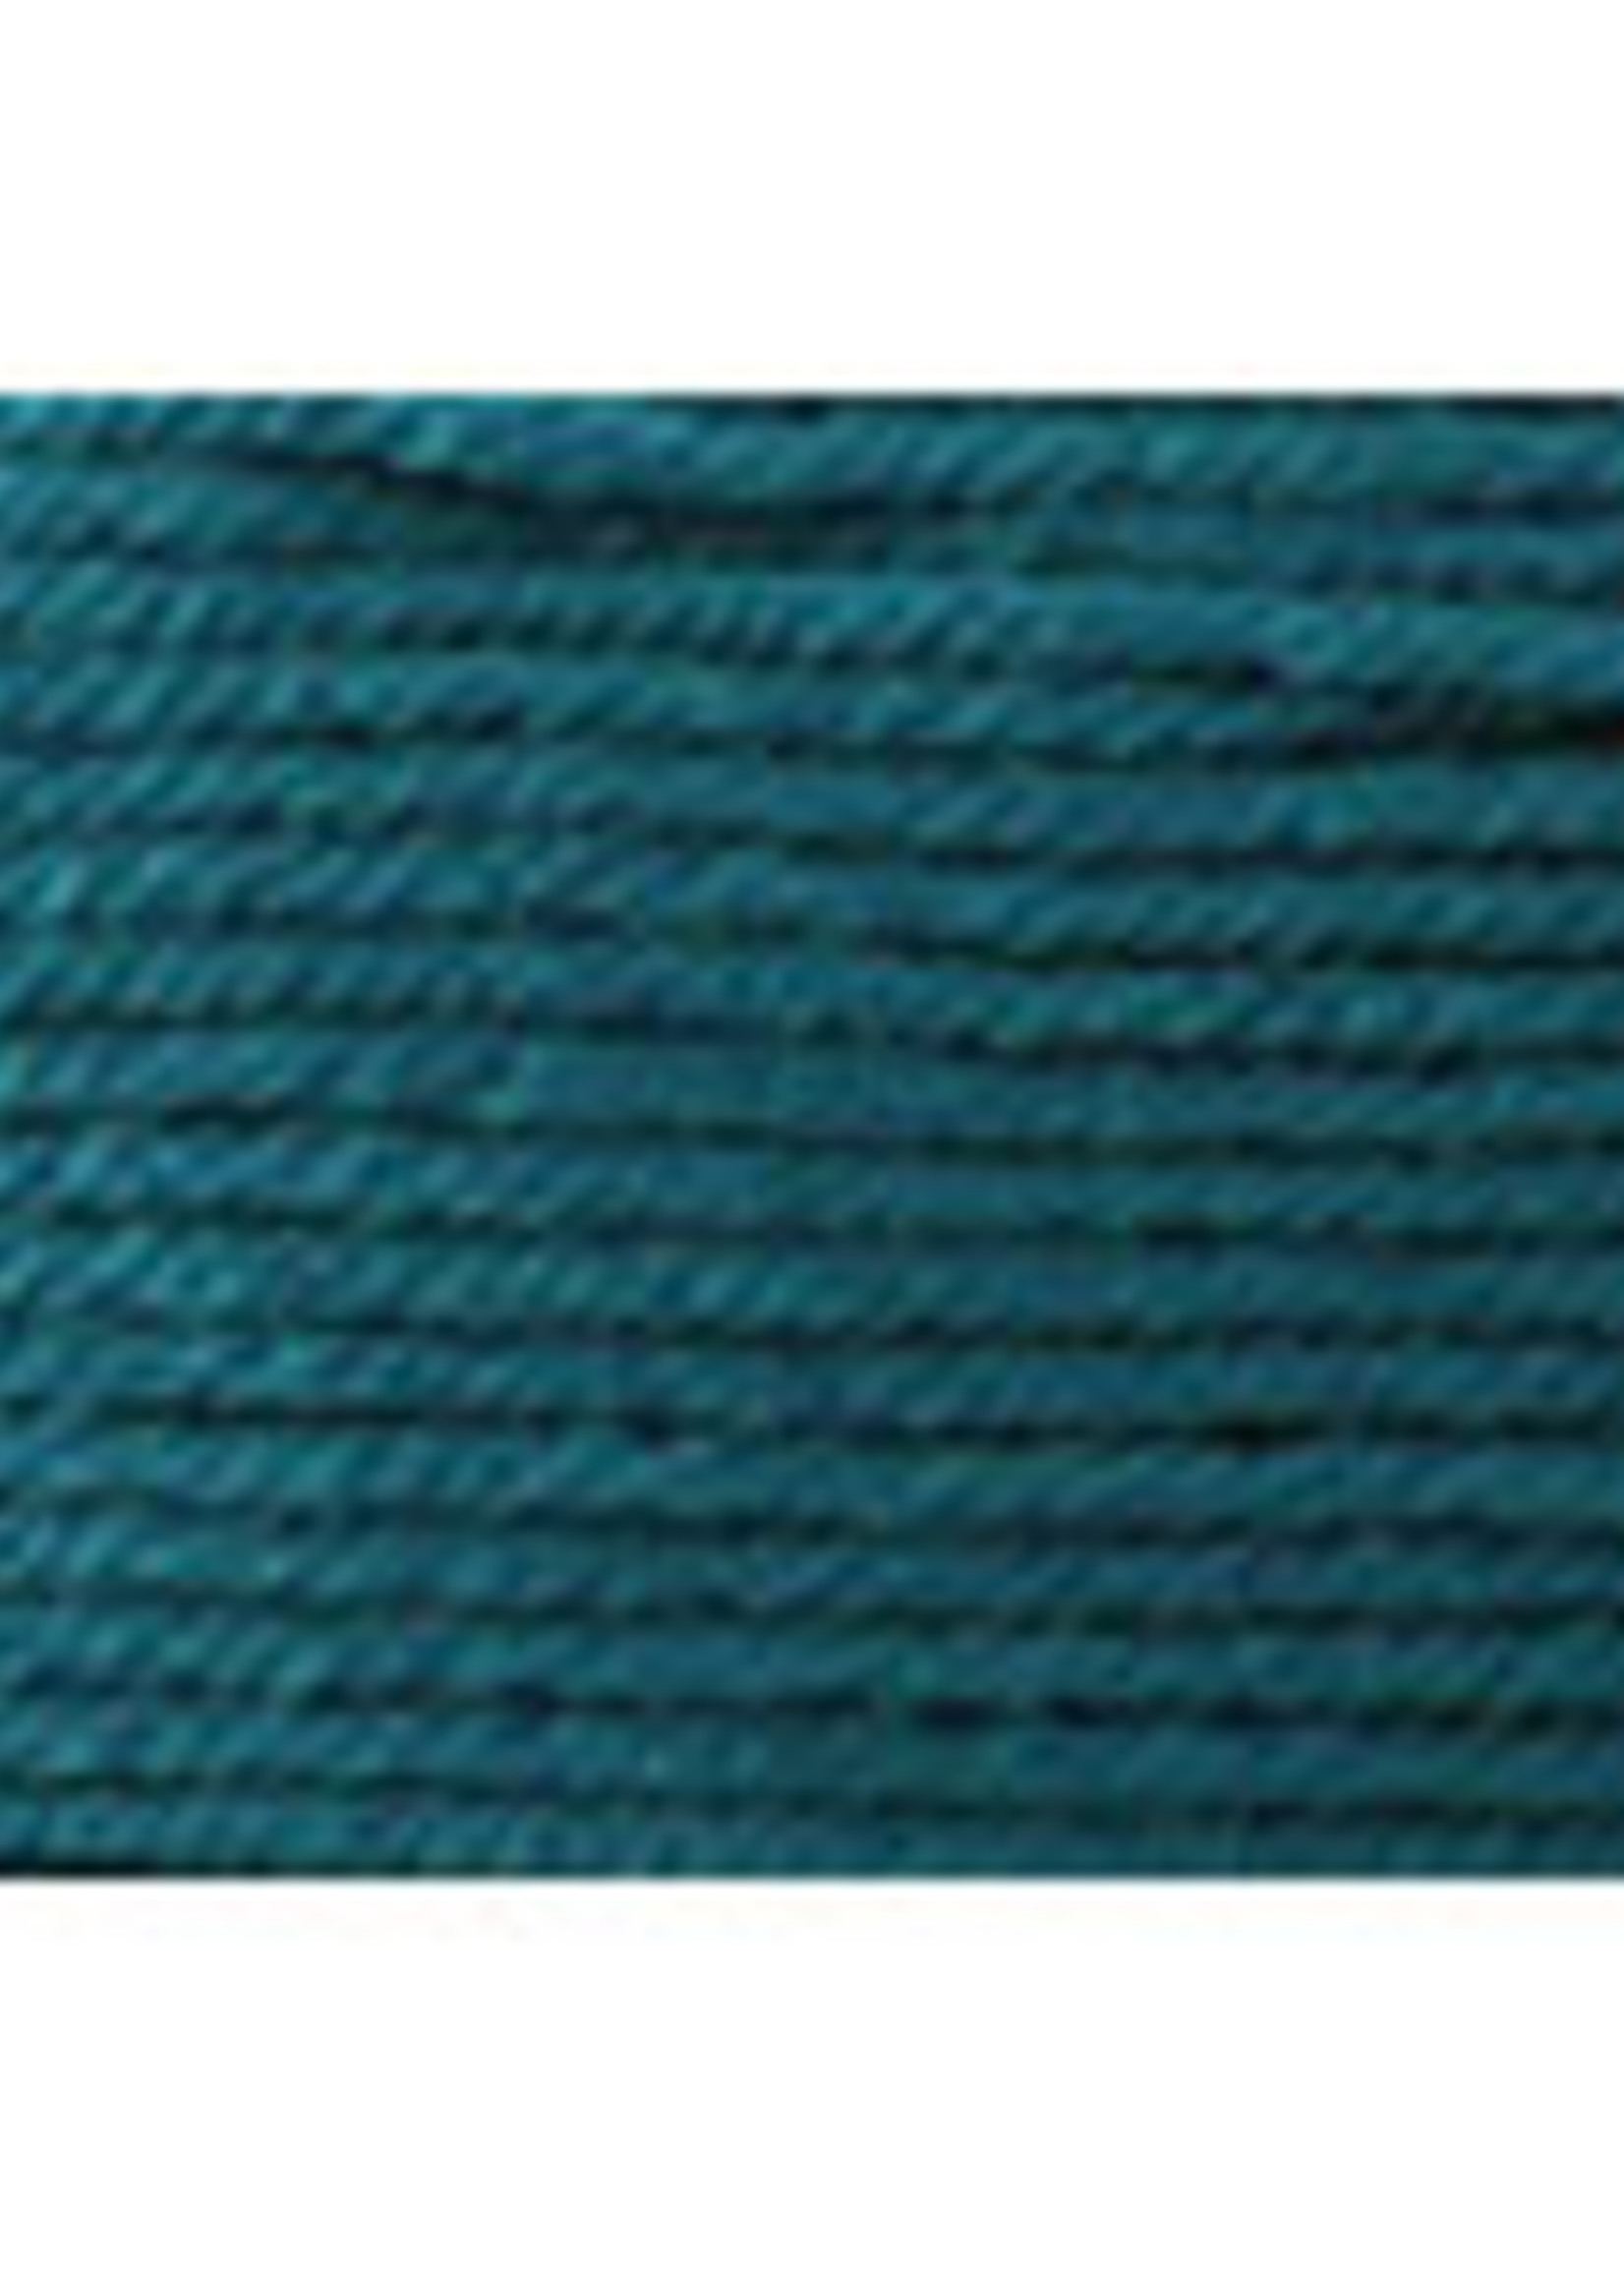 Universal Yarns Universal Yarn Uptown DK 114 Sea